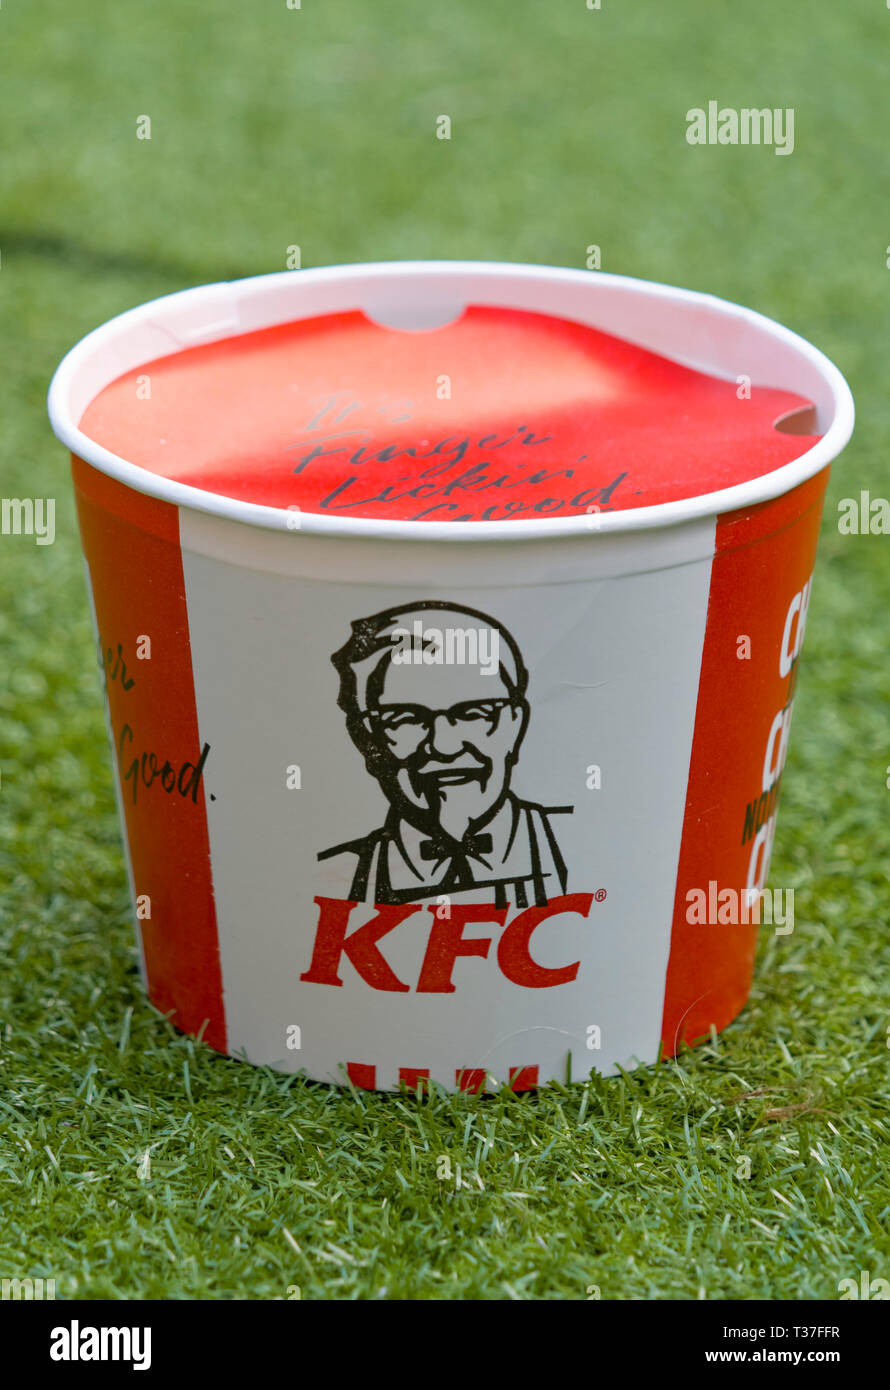 KFC or Kentucky Fried Chicken Bargain Bucket - Stock Image